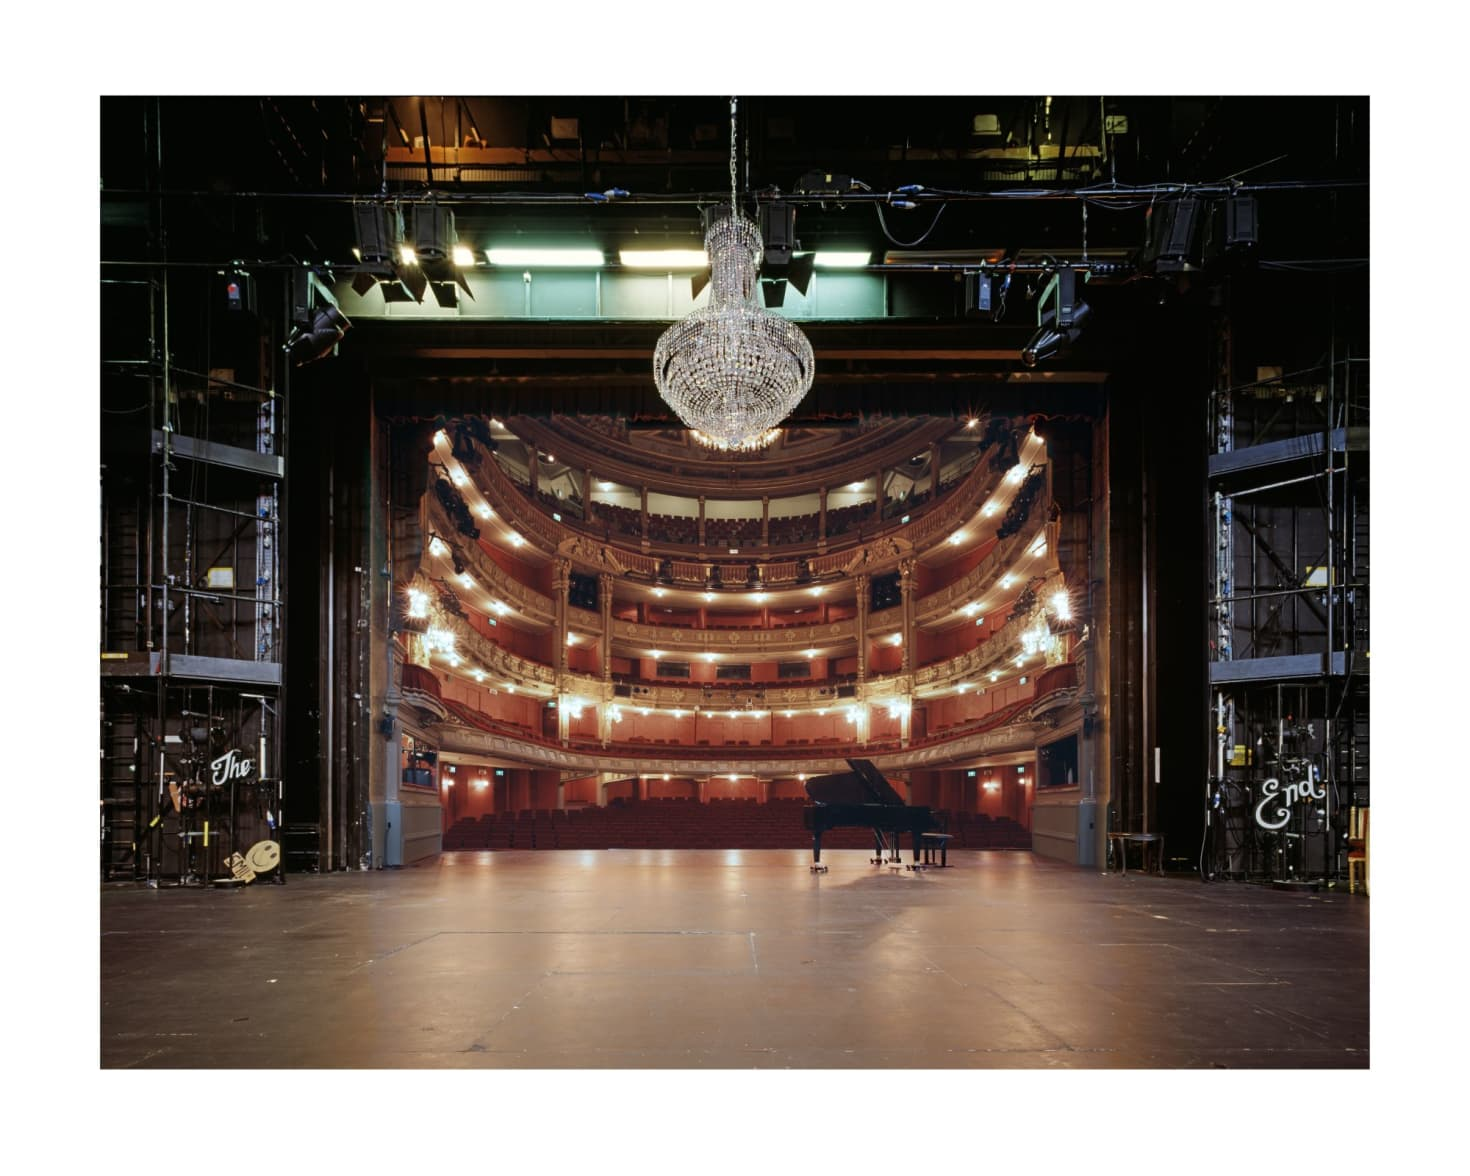 Klaus Frahm Opera Gent Belgium 2016 Courtesy Galerie XII Los Angeles